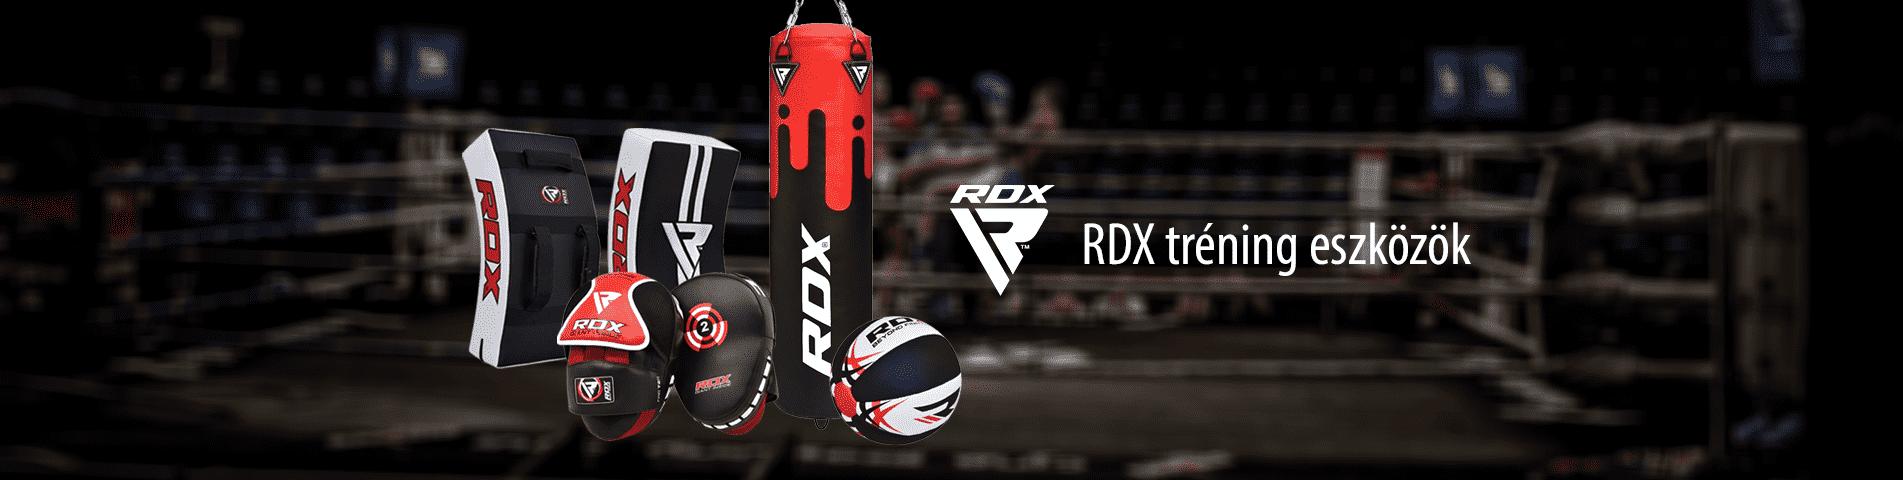 rdx_trening_eszkozok